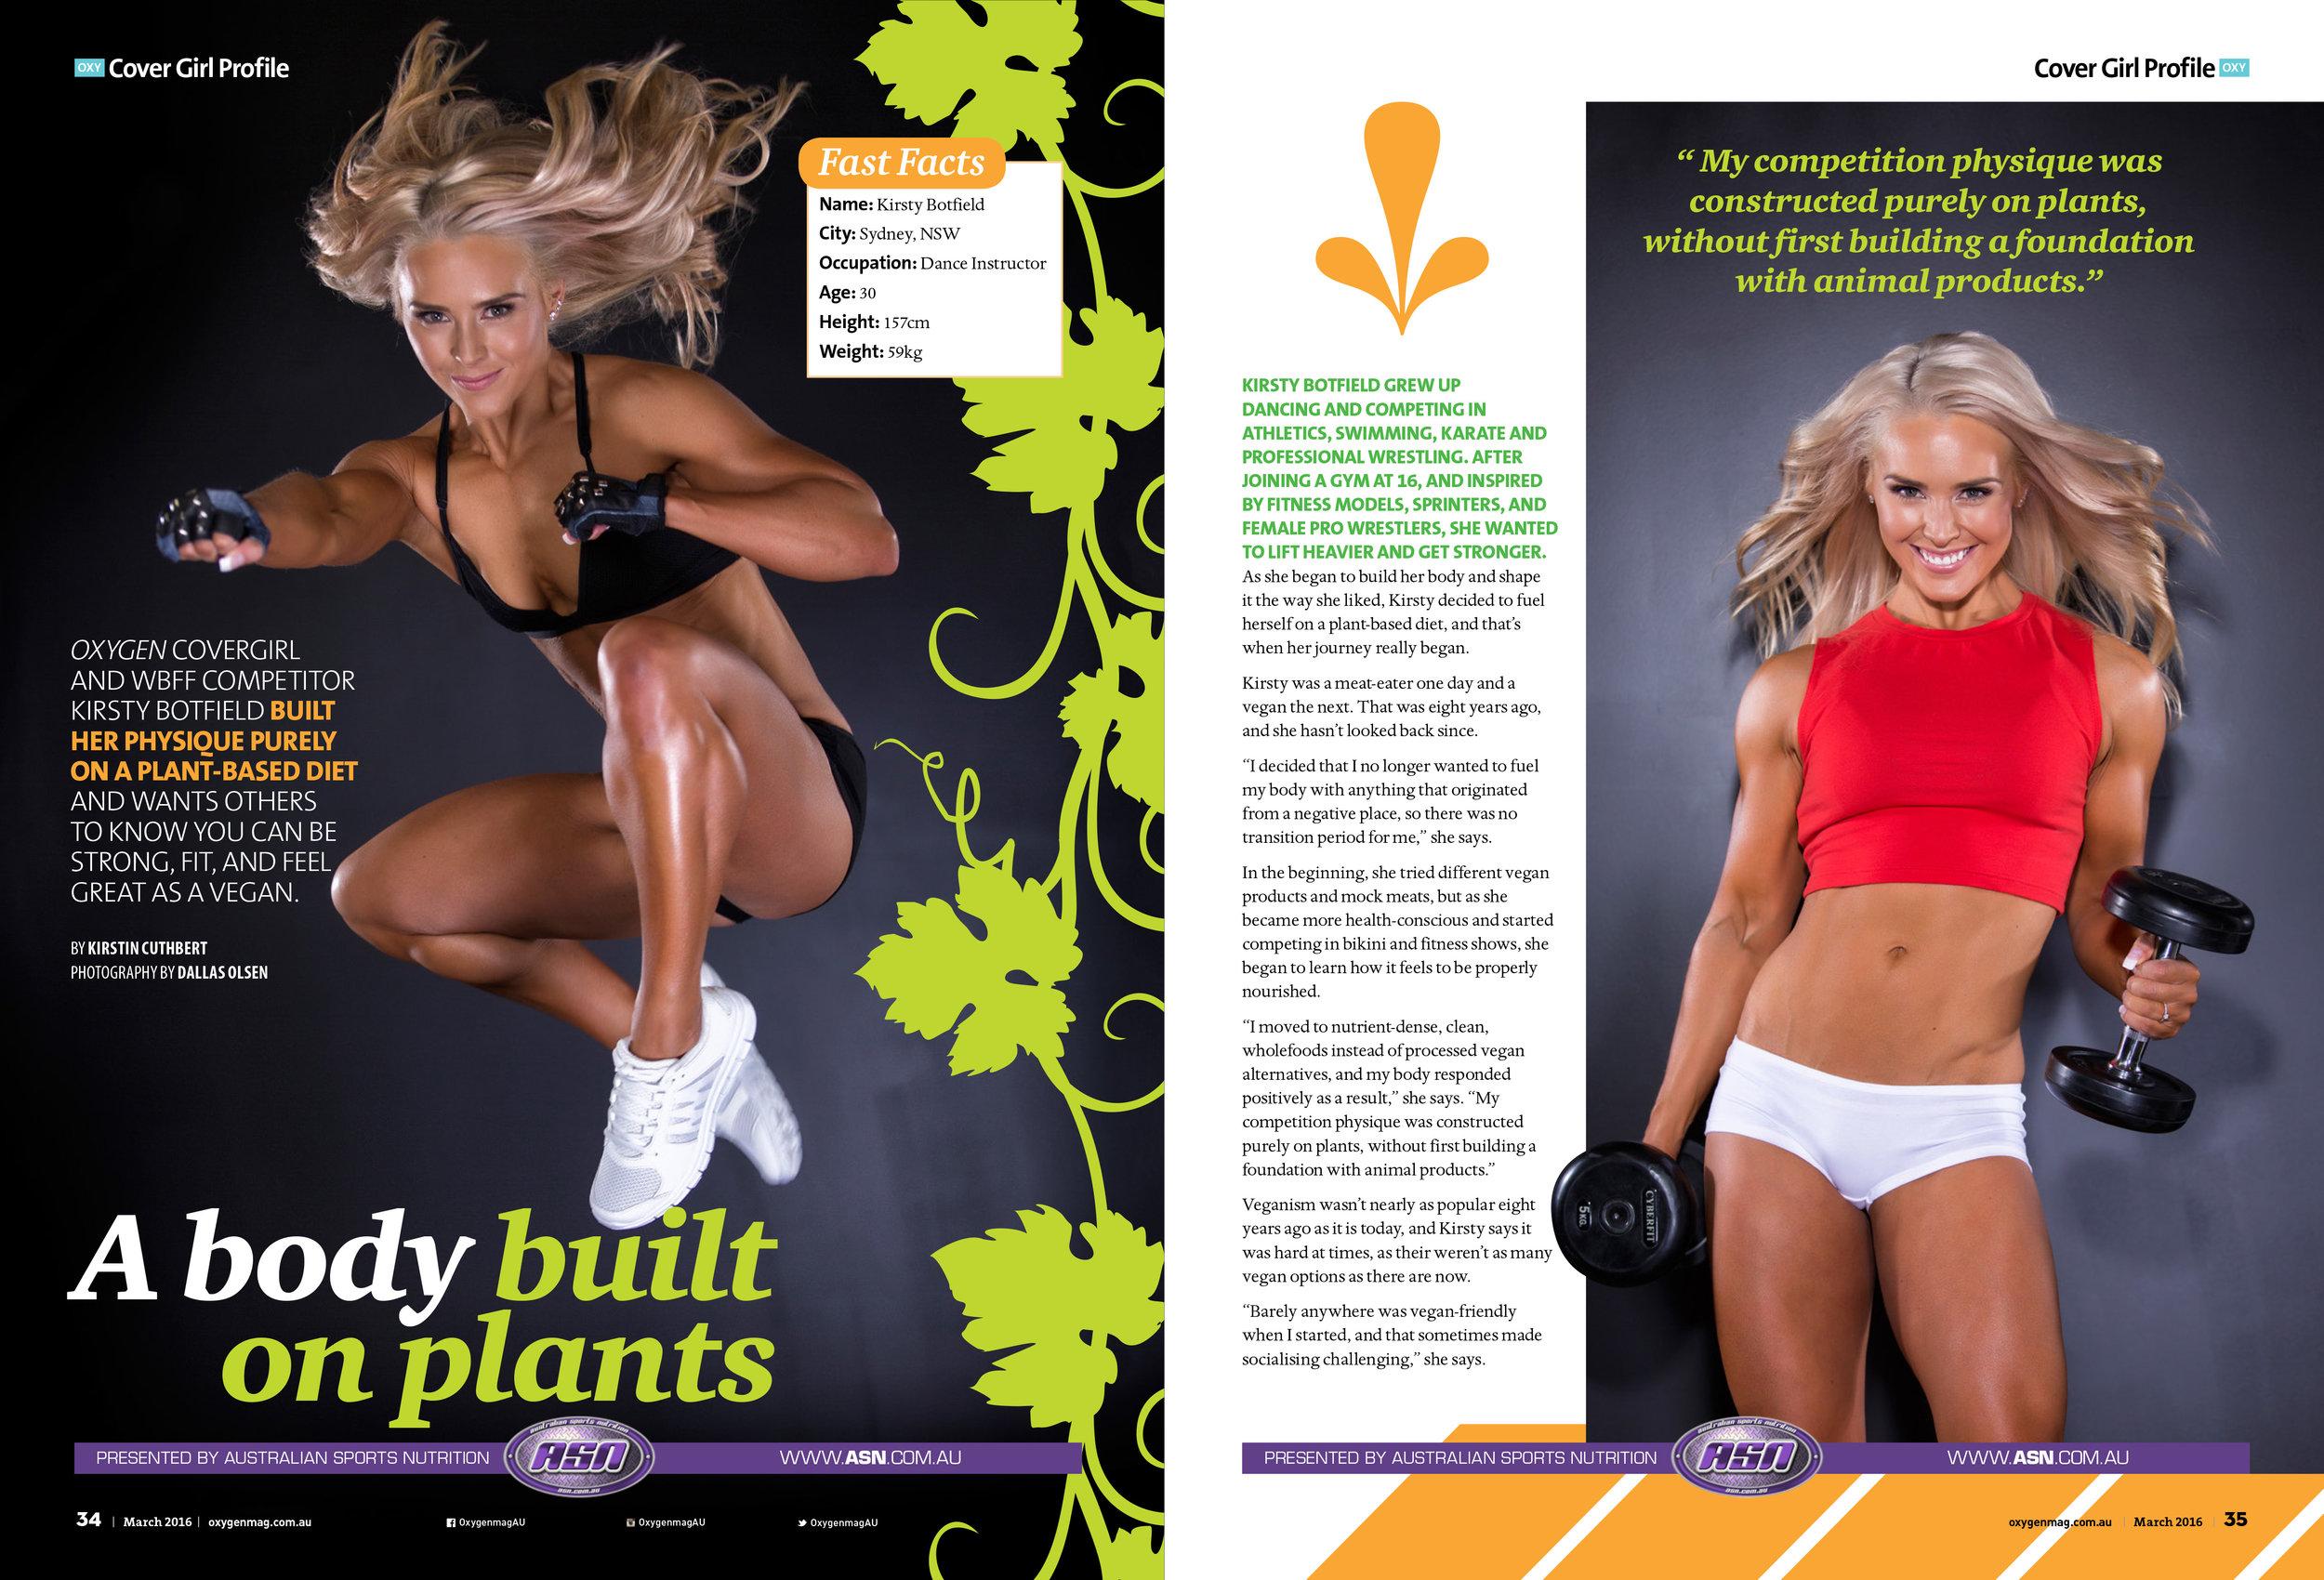 Oxygen Magazine cover girl - kirsty botfield